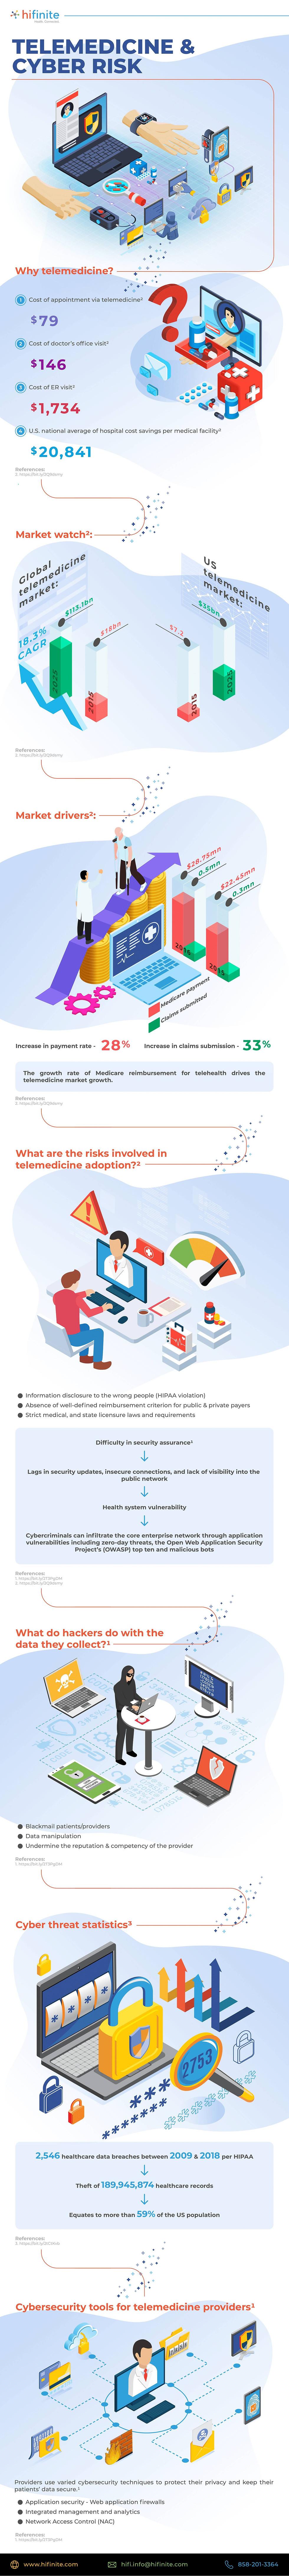 Telemedicine & cyber risk.jpg